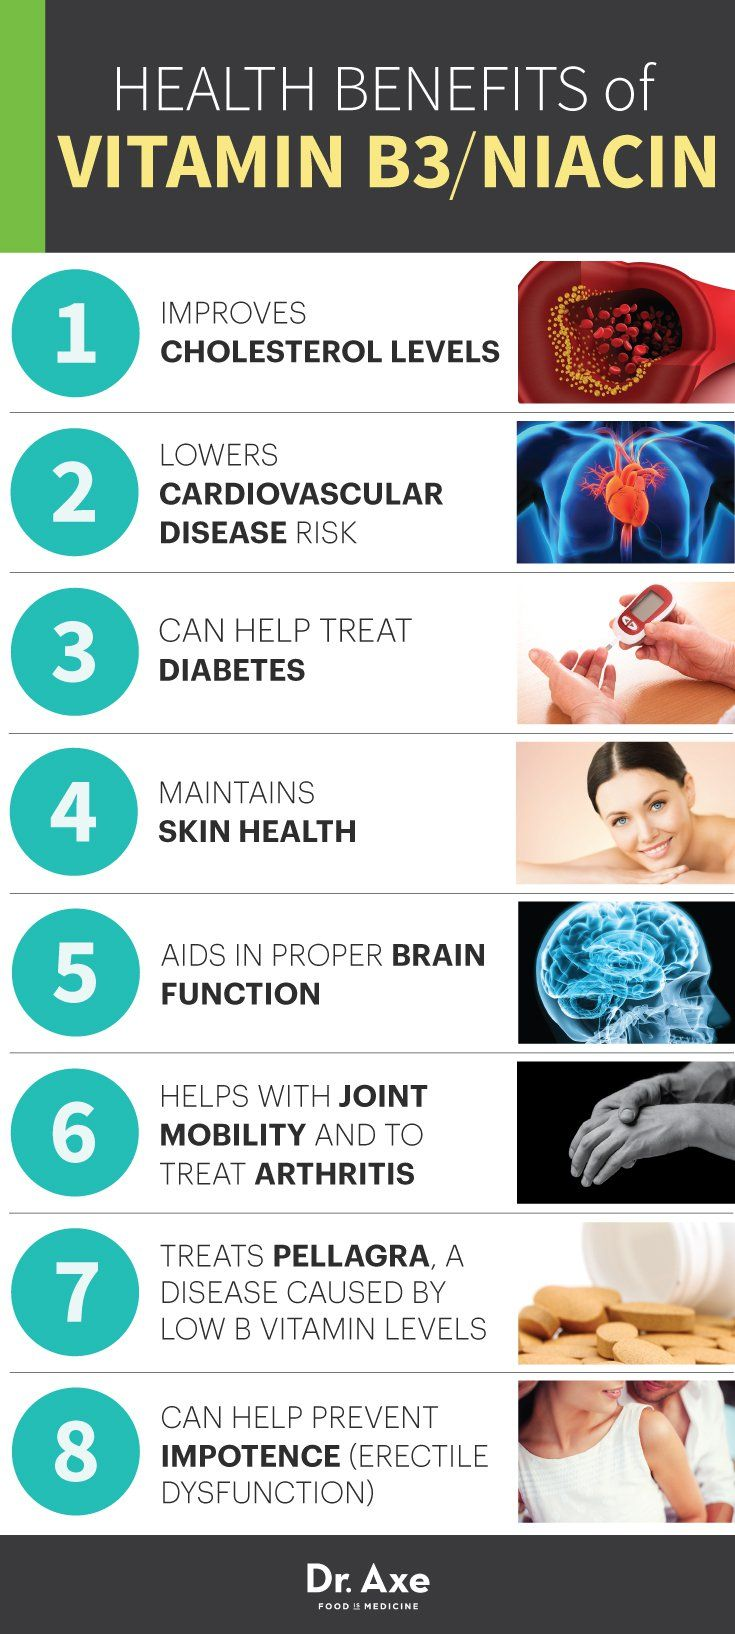 Vitamin B3 / Niacin Side Effects, Benefits & Foods - Dr. Axe